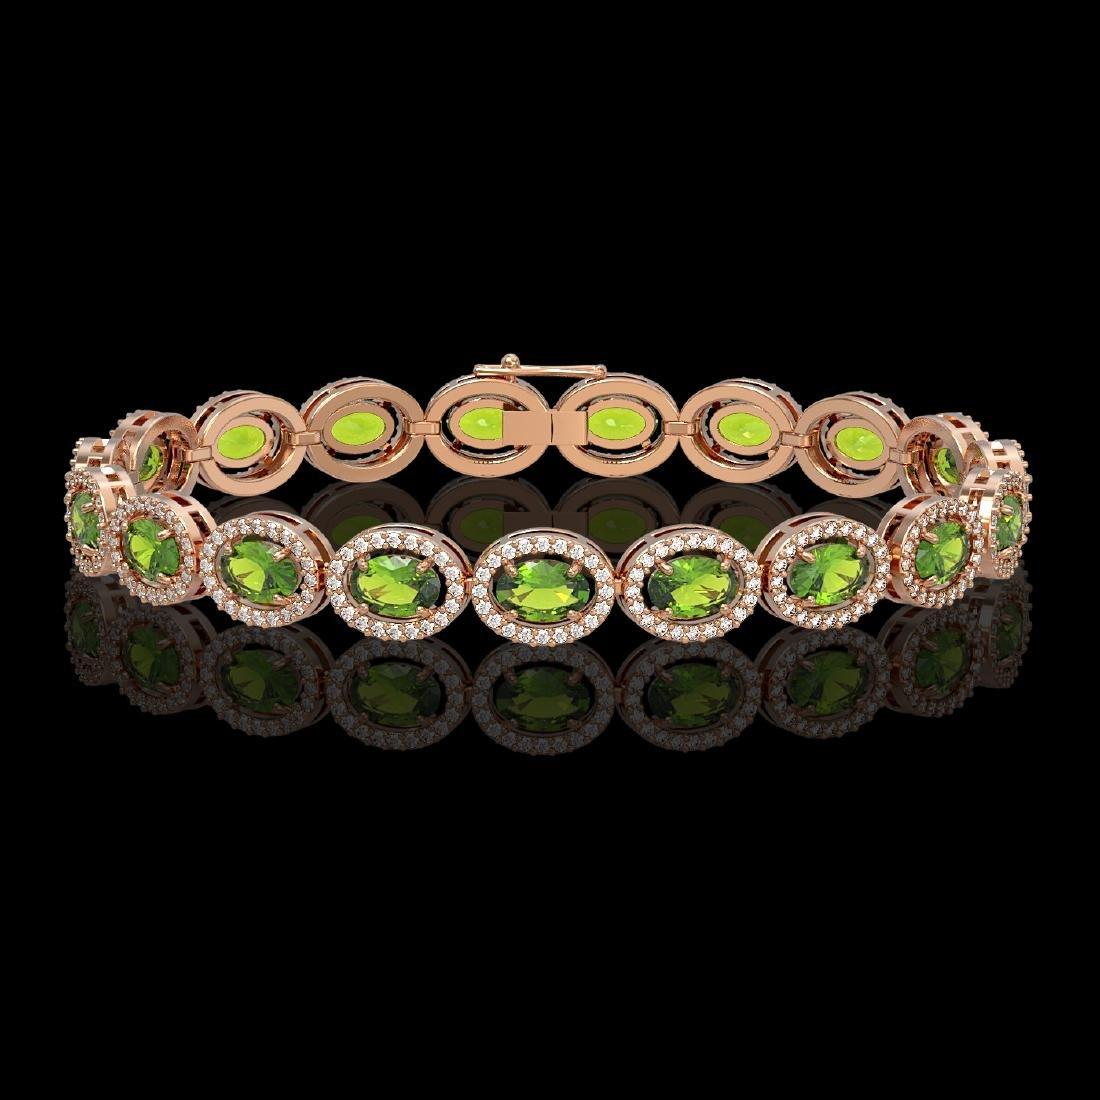 13.87 CTW Peridot & Diamond Halo Bracelet 10K Rose Gold